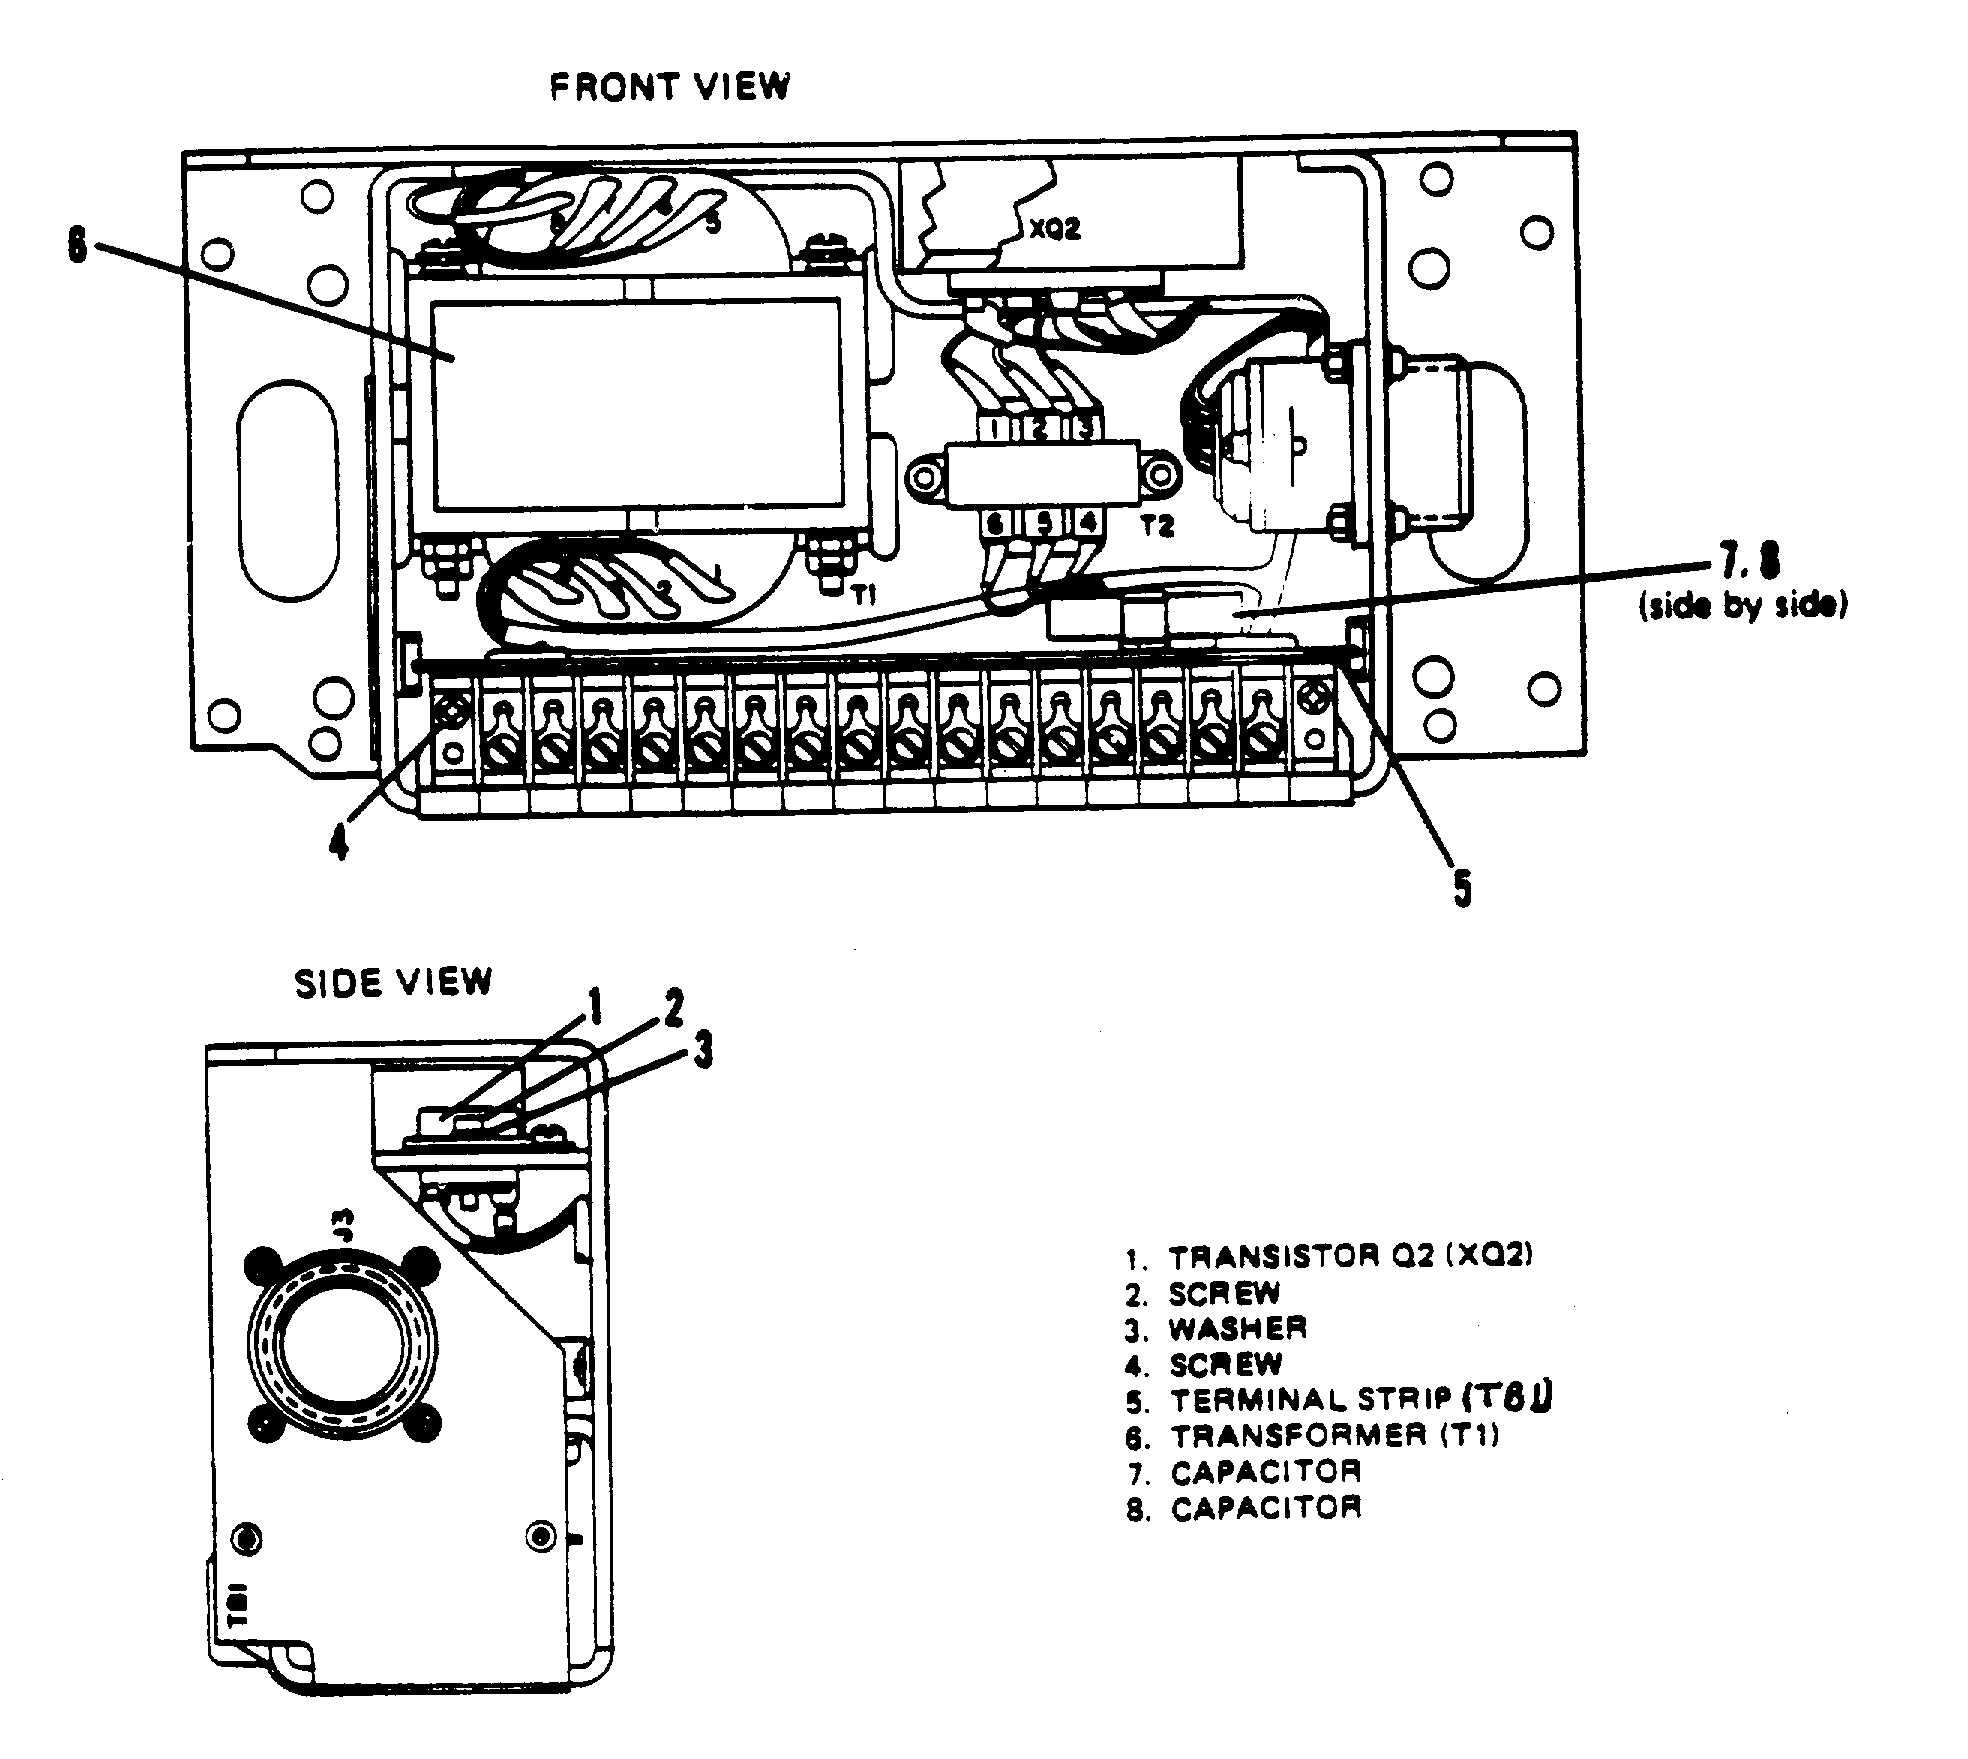 Onan 15kw Generator Diagram All Kind Of Wiring Diagrams Propane Electrical Tm 5 6115 Silverado Trailer Harness Seat Carburetor